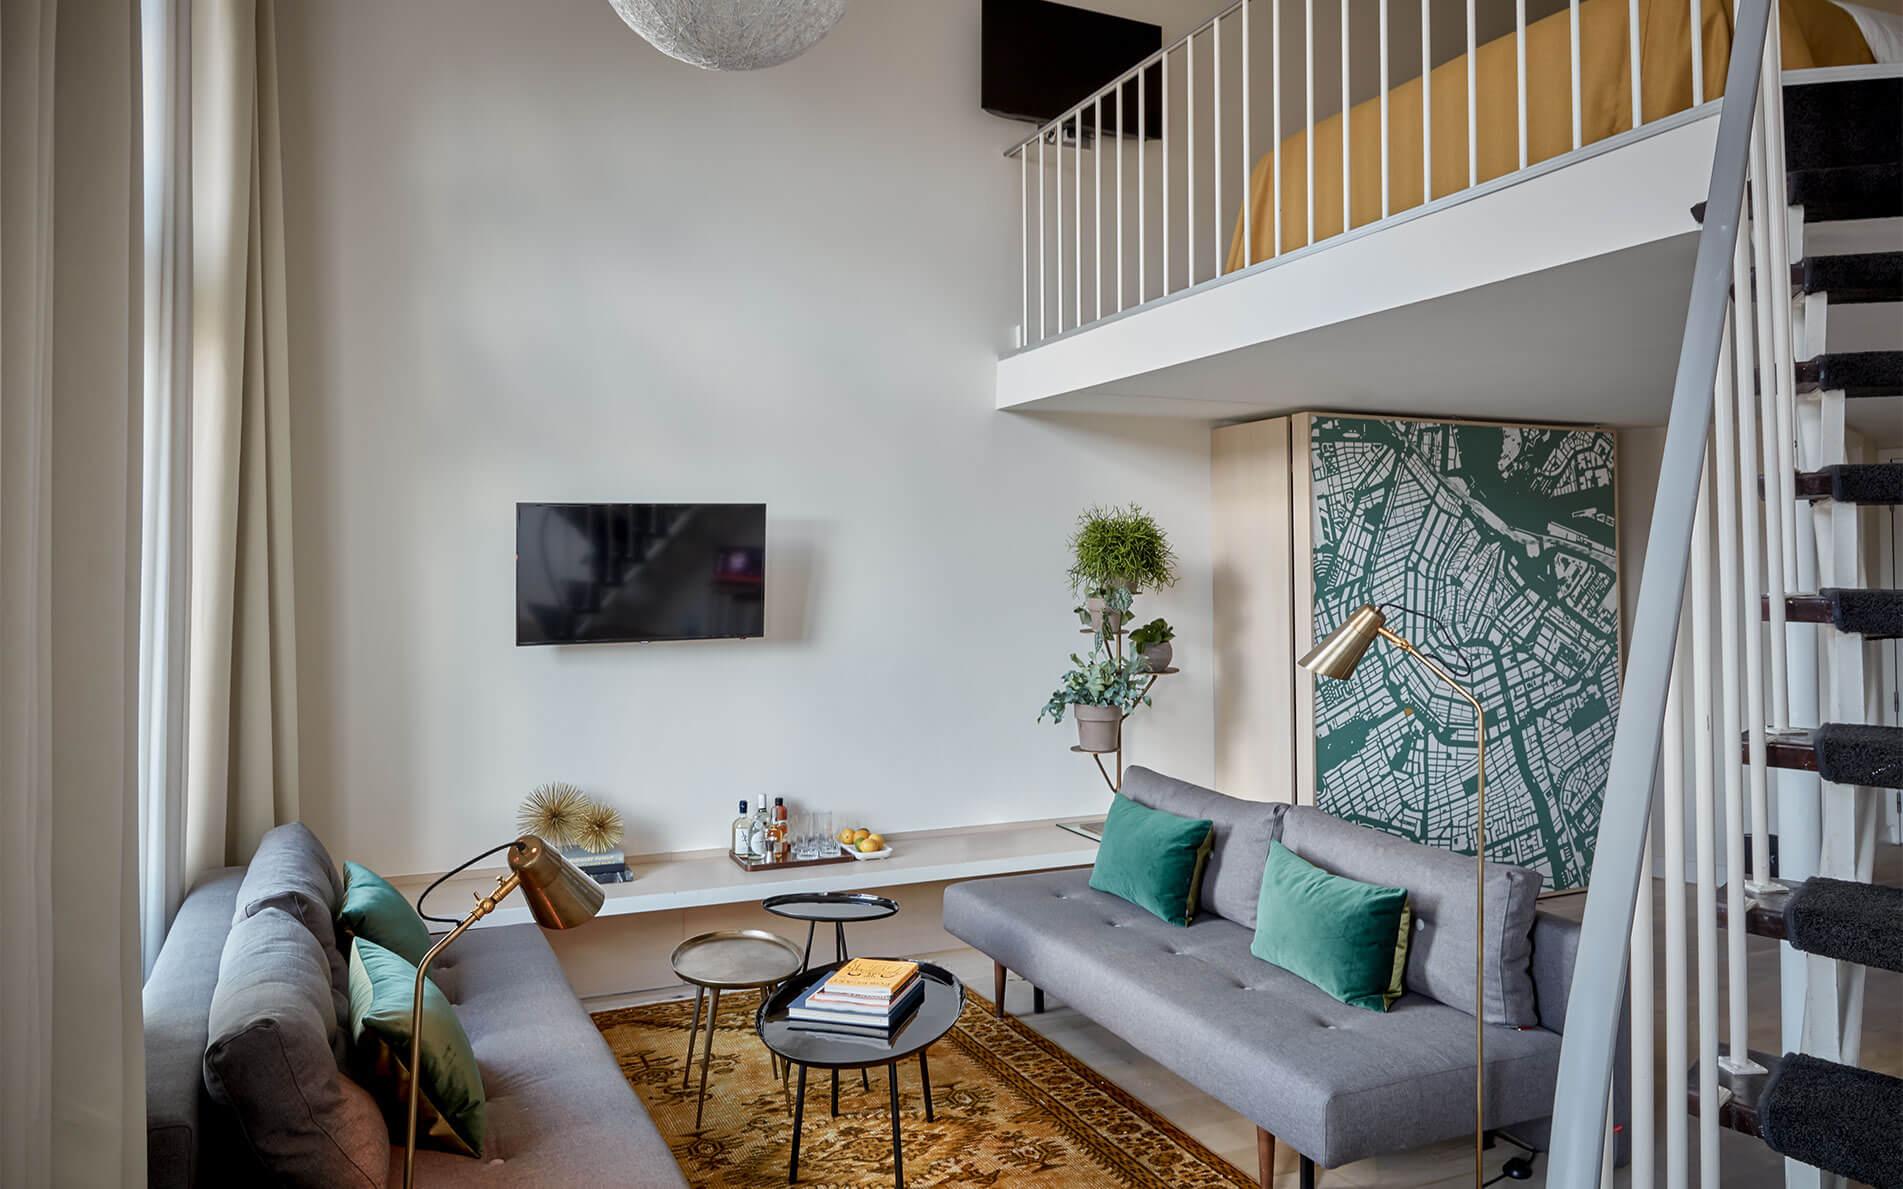 park-hotel-amsterdam-split-level-loft-suite-header